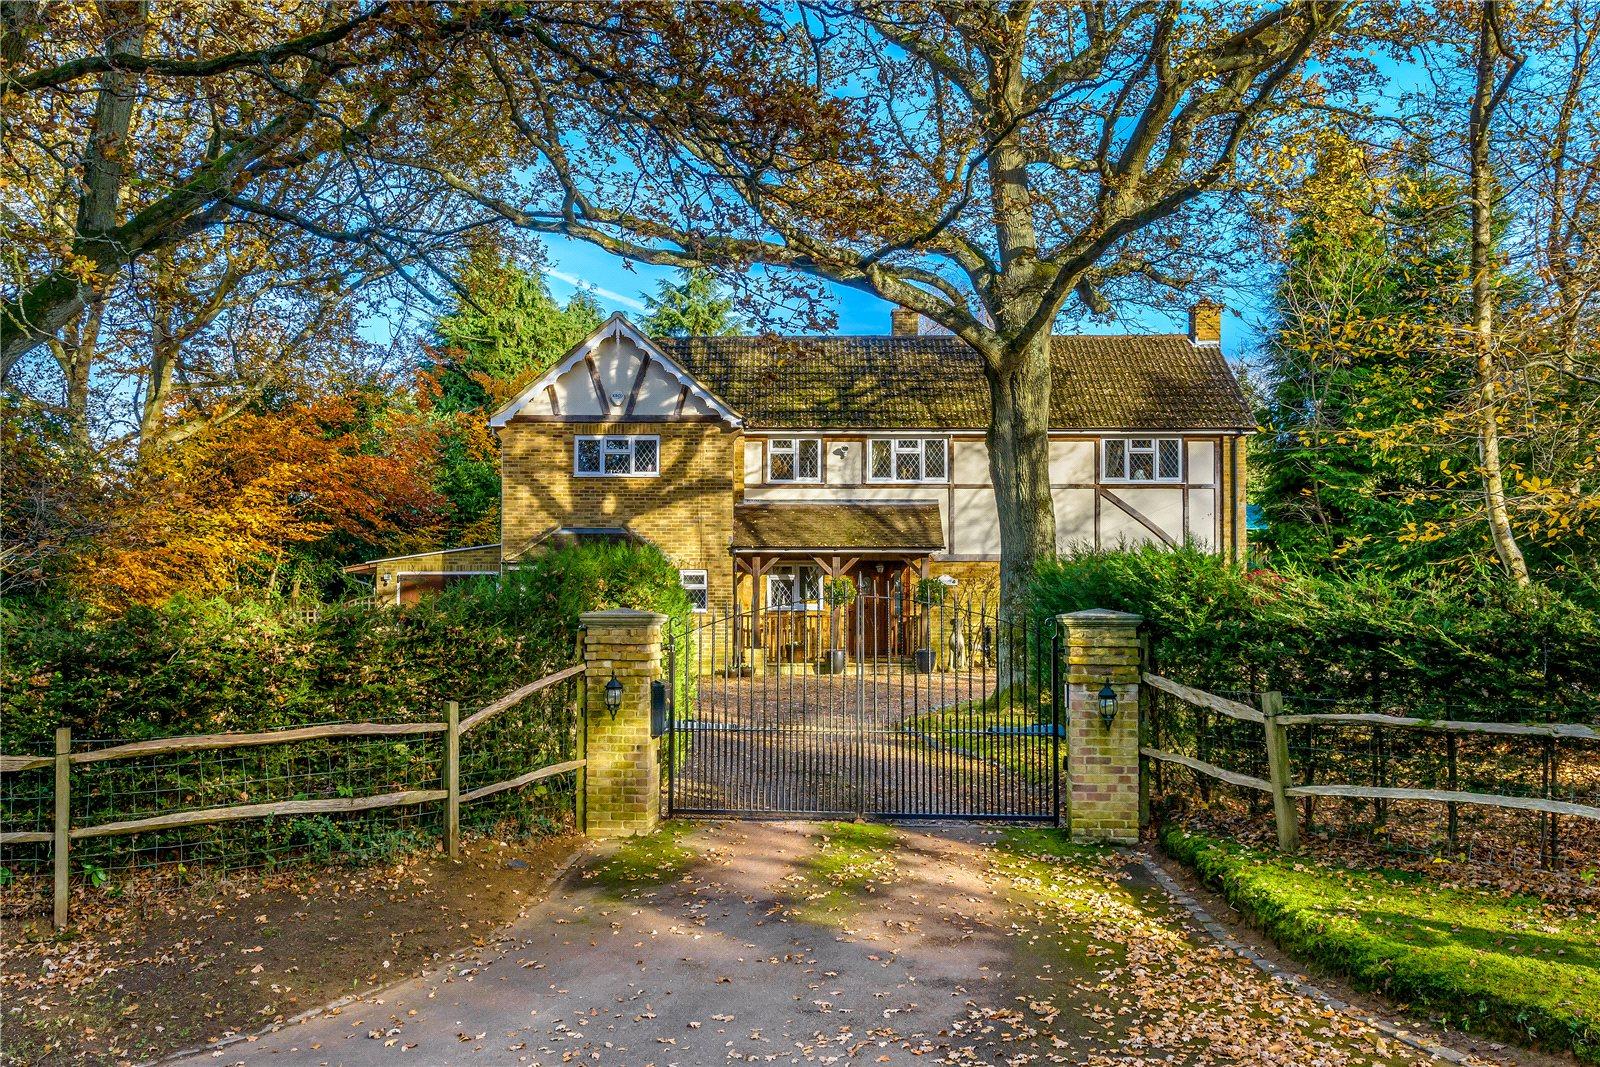 独户住宅 为 销售 在 Binton Lane, Seale, Farnham, Surrey, GU10 Farnham, 英格兰